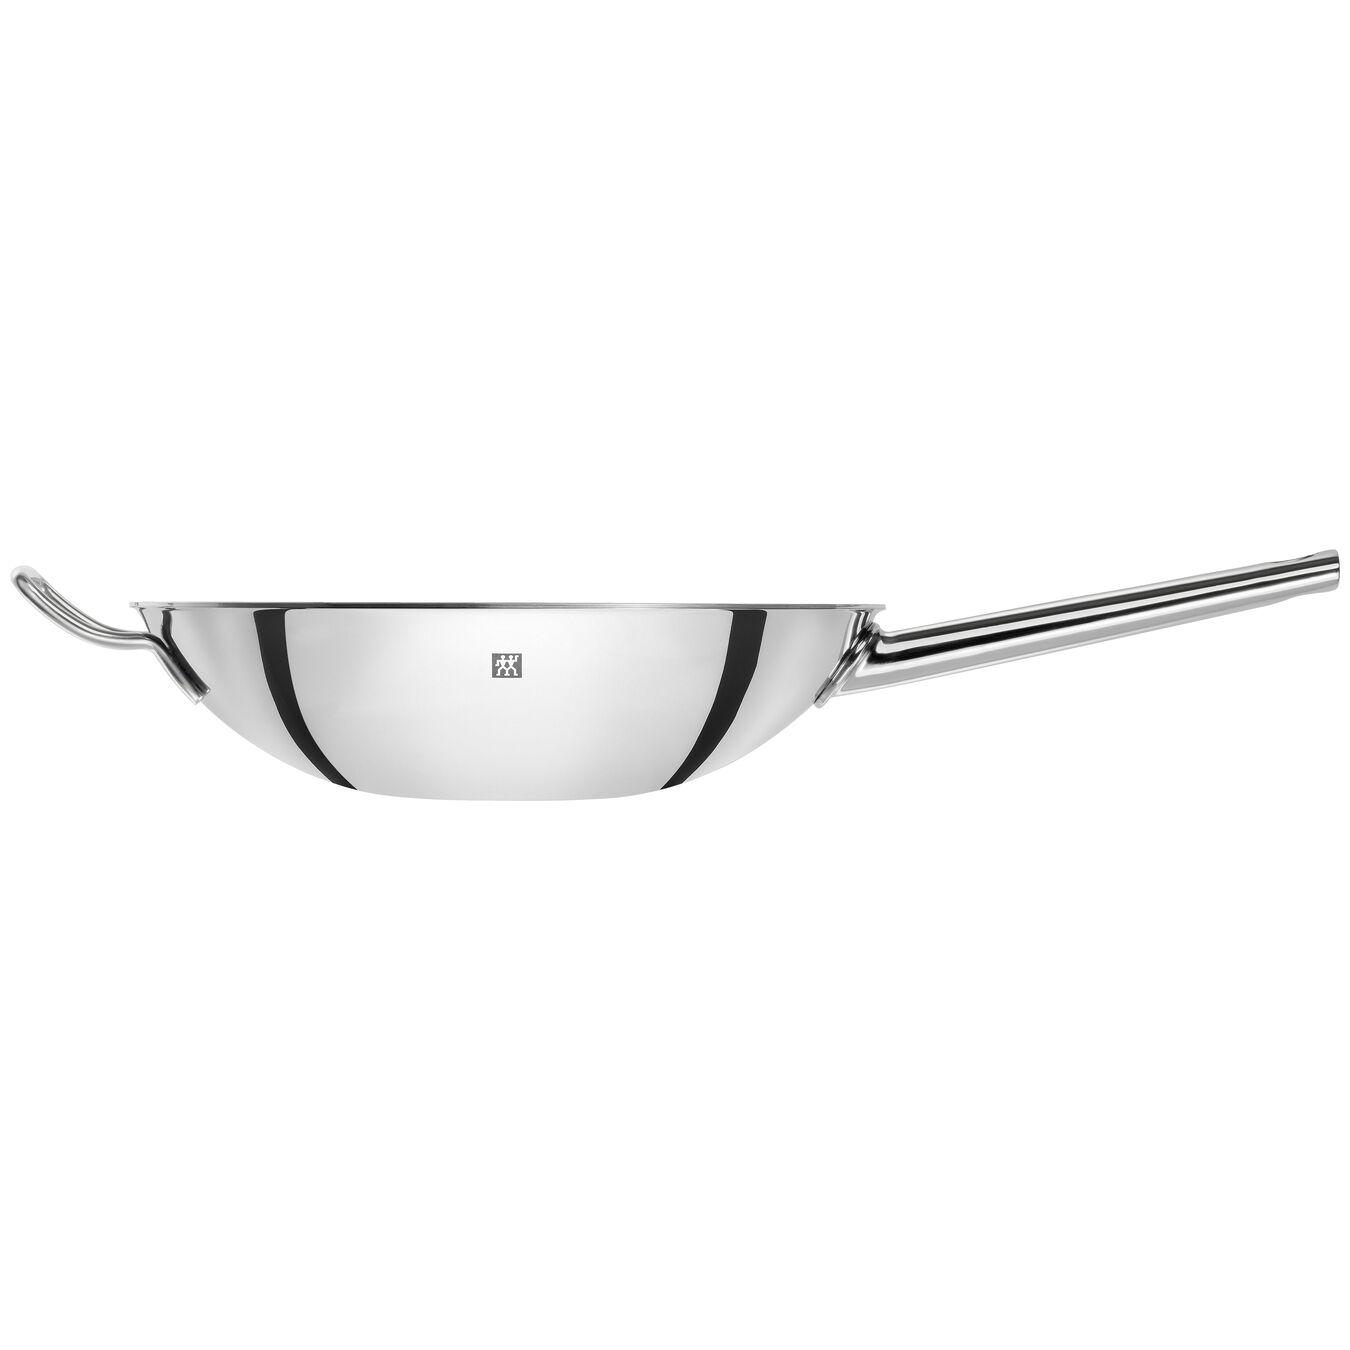 Wok - 32 cm, acciaio, Ceraforce Ultra,,large 5